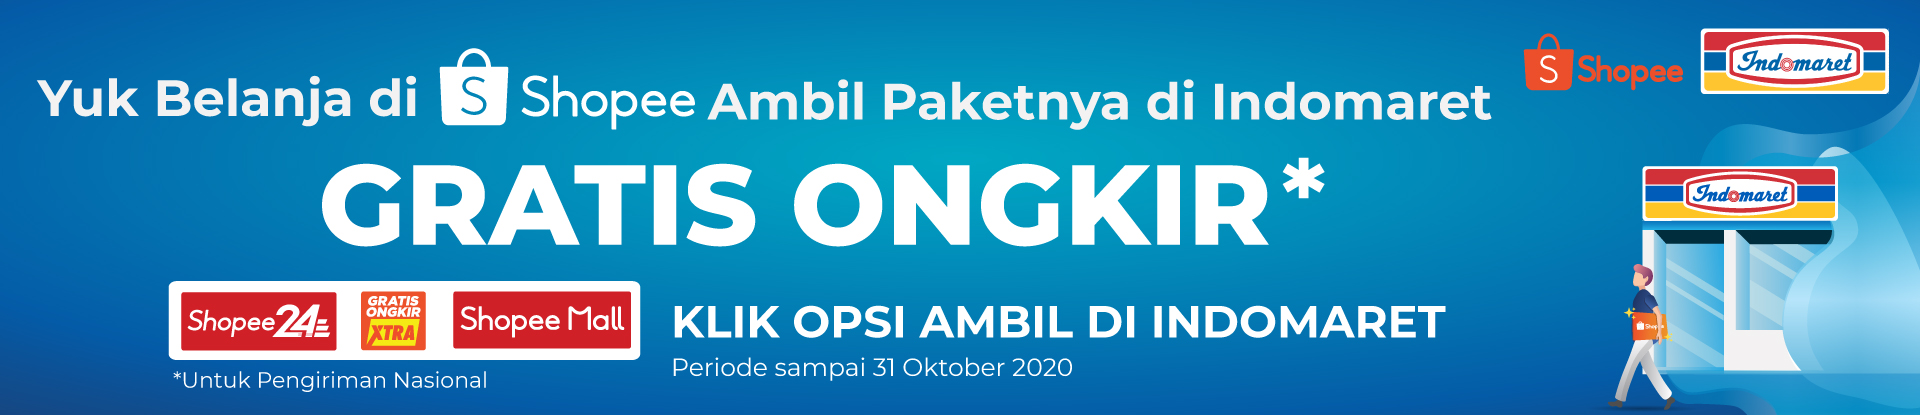 Shopee oktober 2020